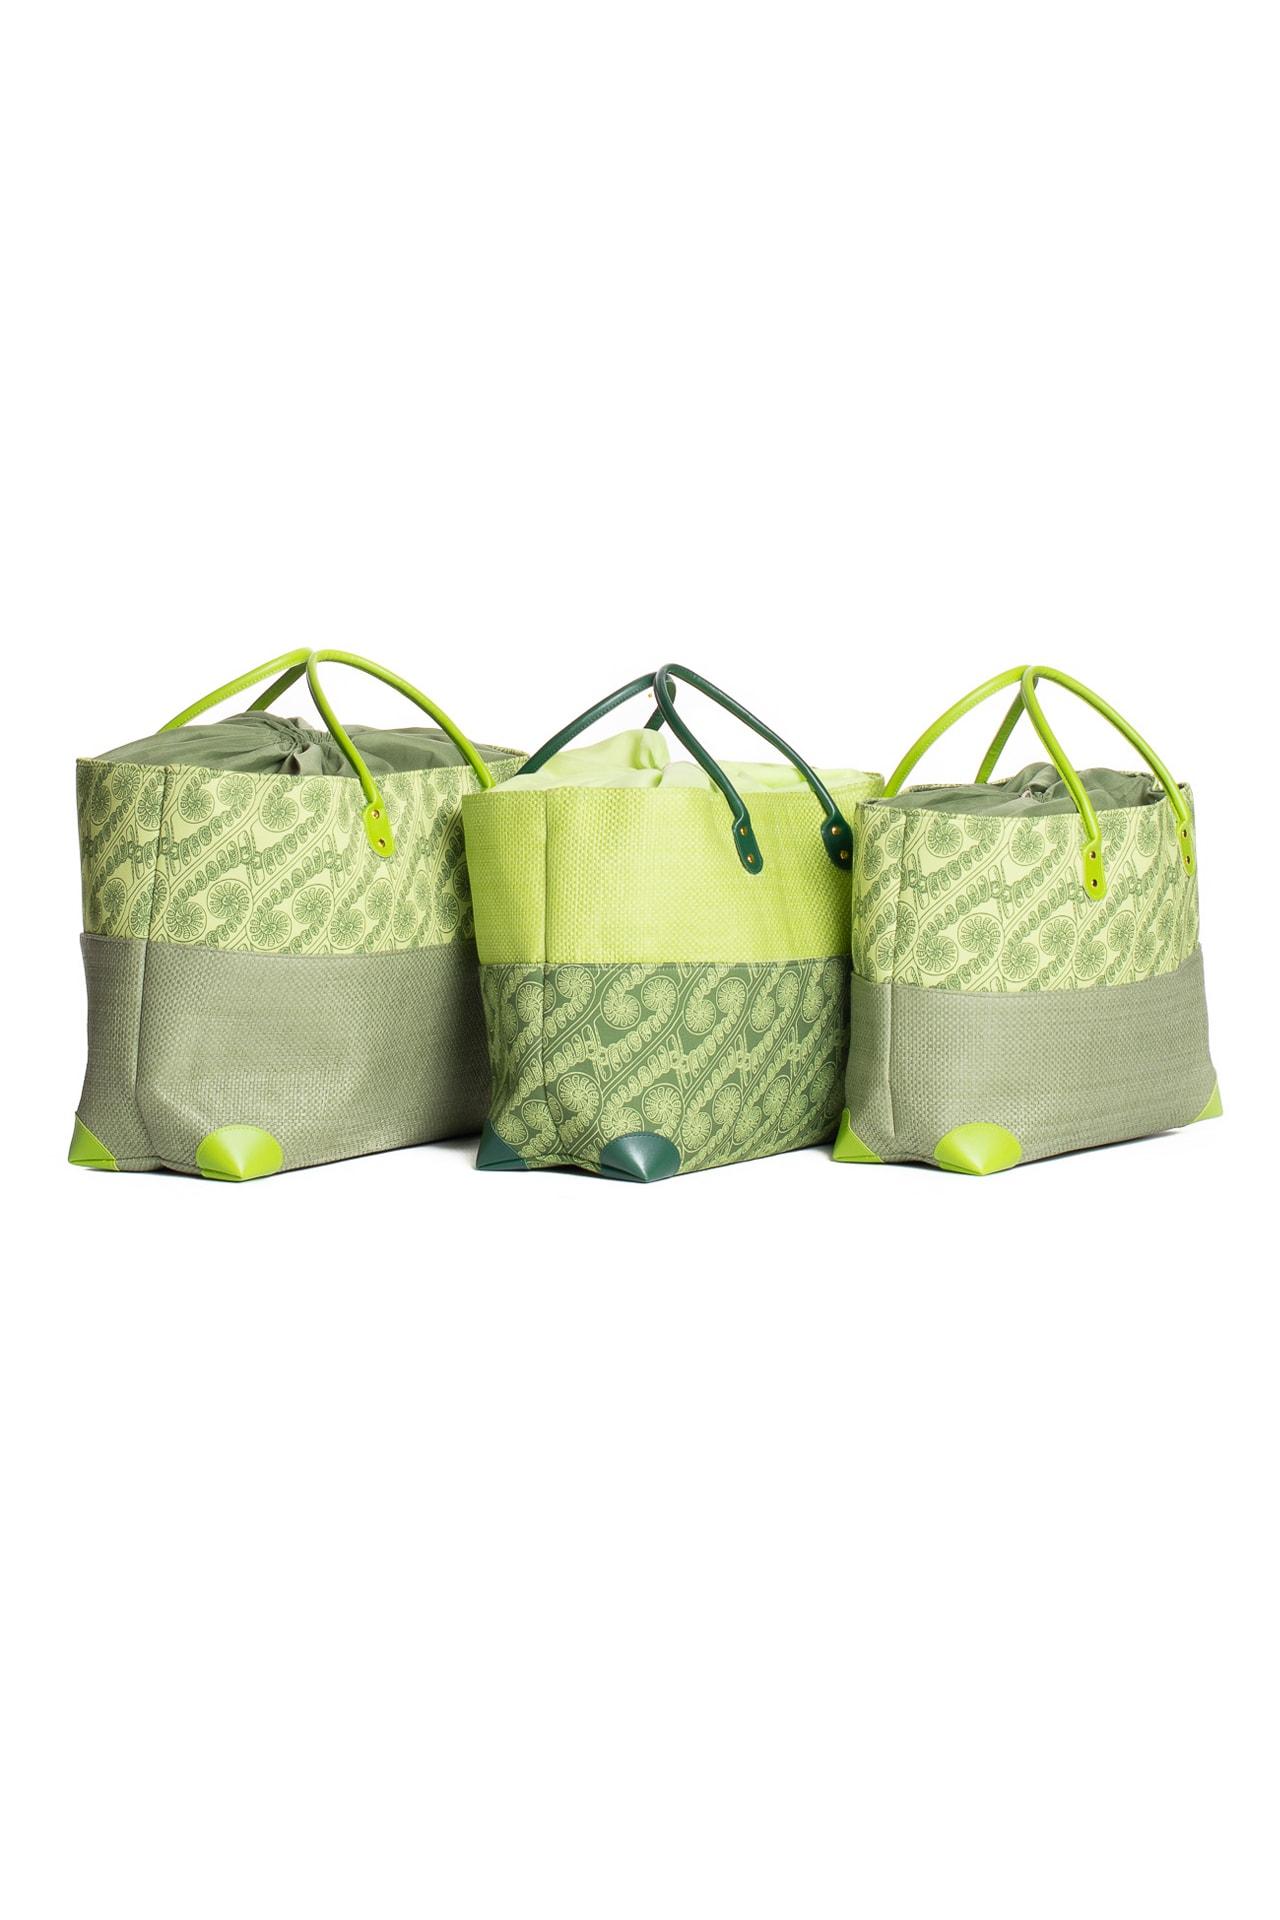 Hula Trio Bag Set in Amau